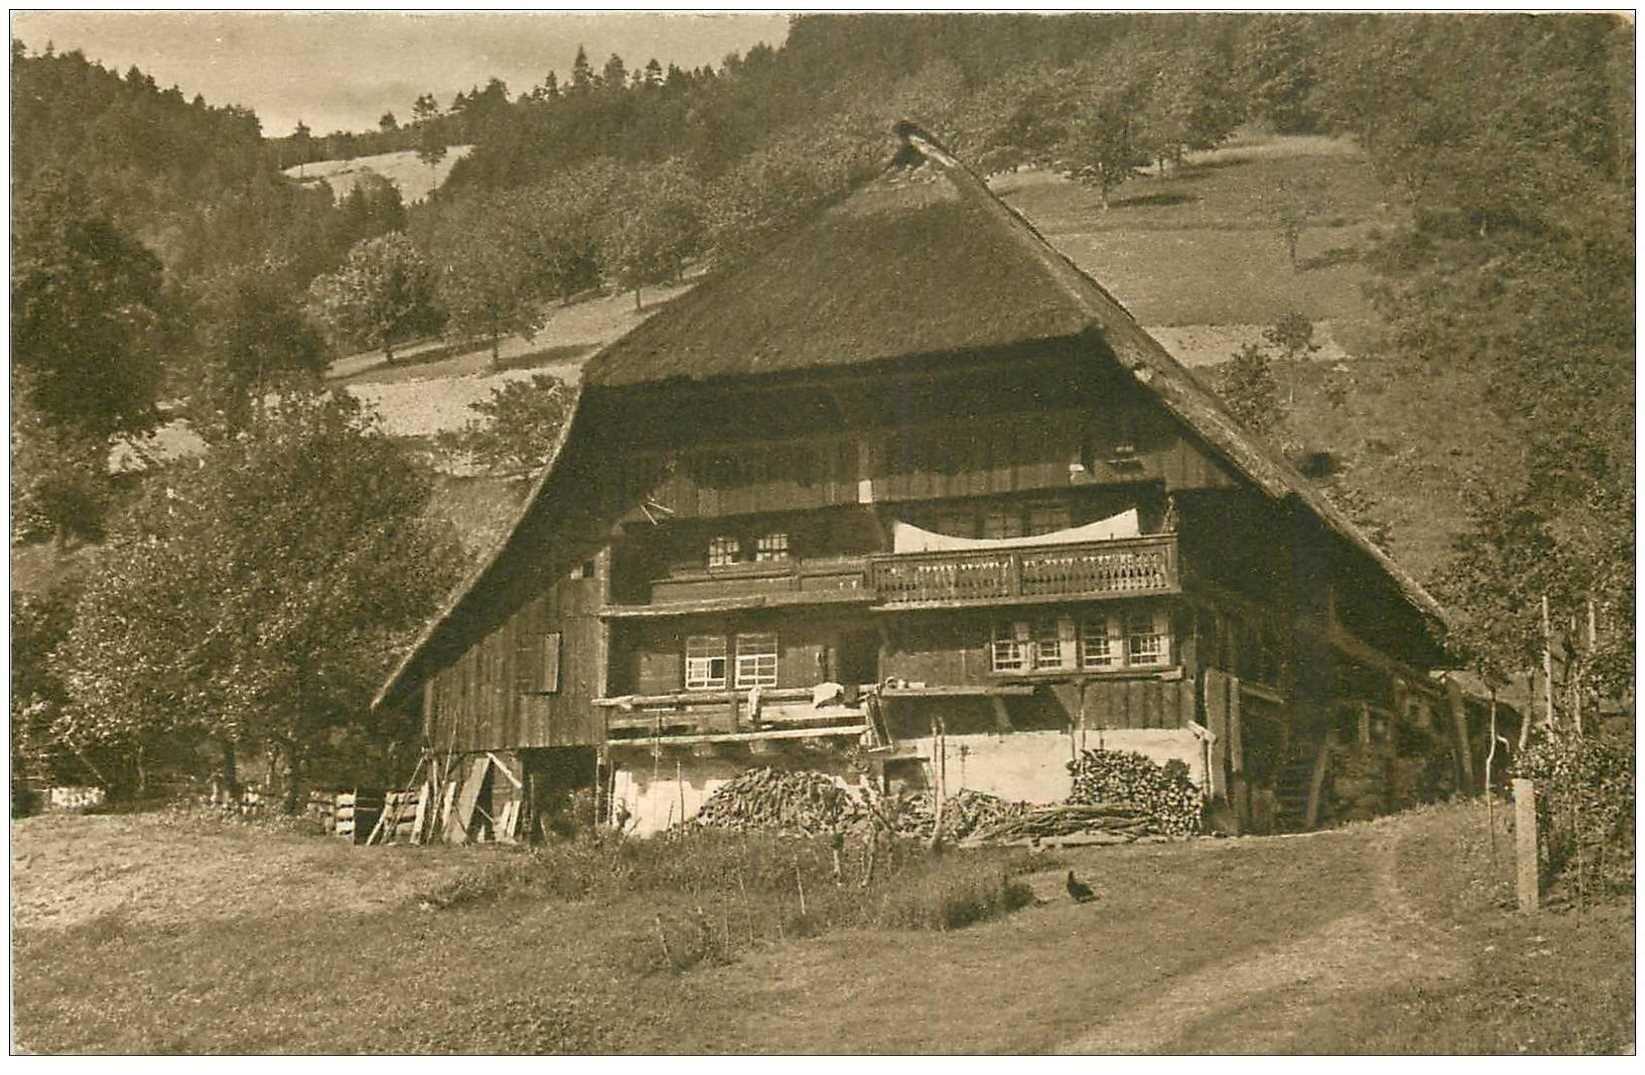 carte postale ancienne DEUTSCH ALLEMAGNE. Schwarzwald Bauernhaus 1913 carte déliassée